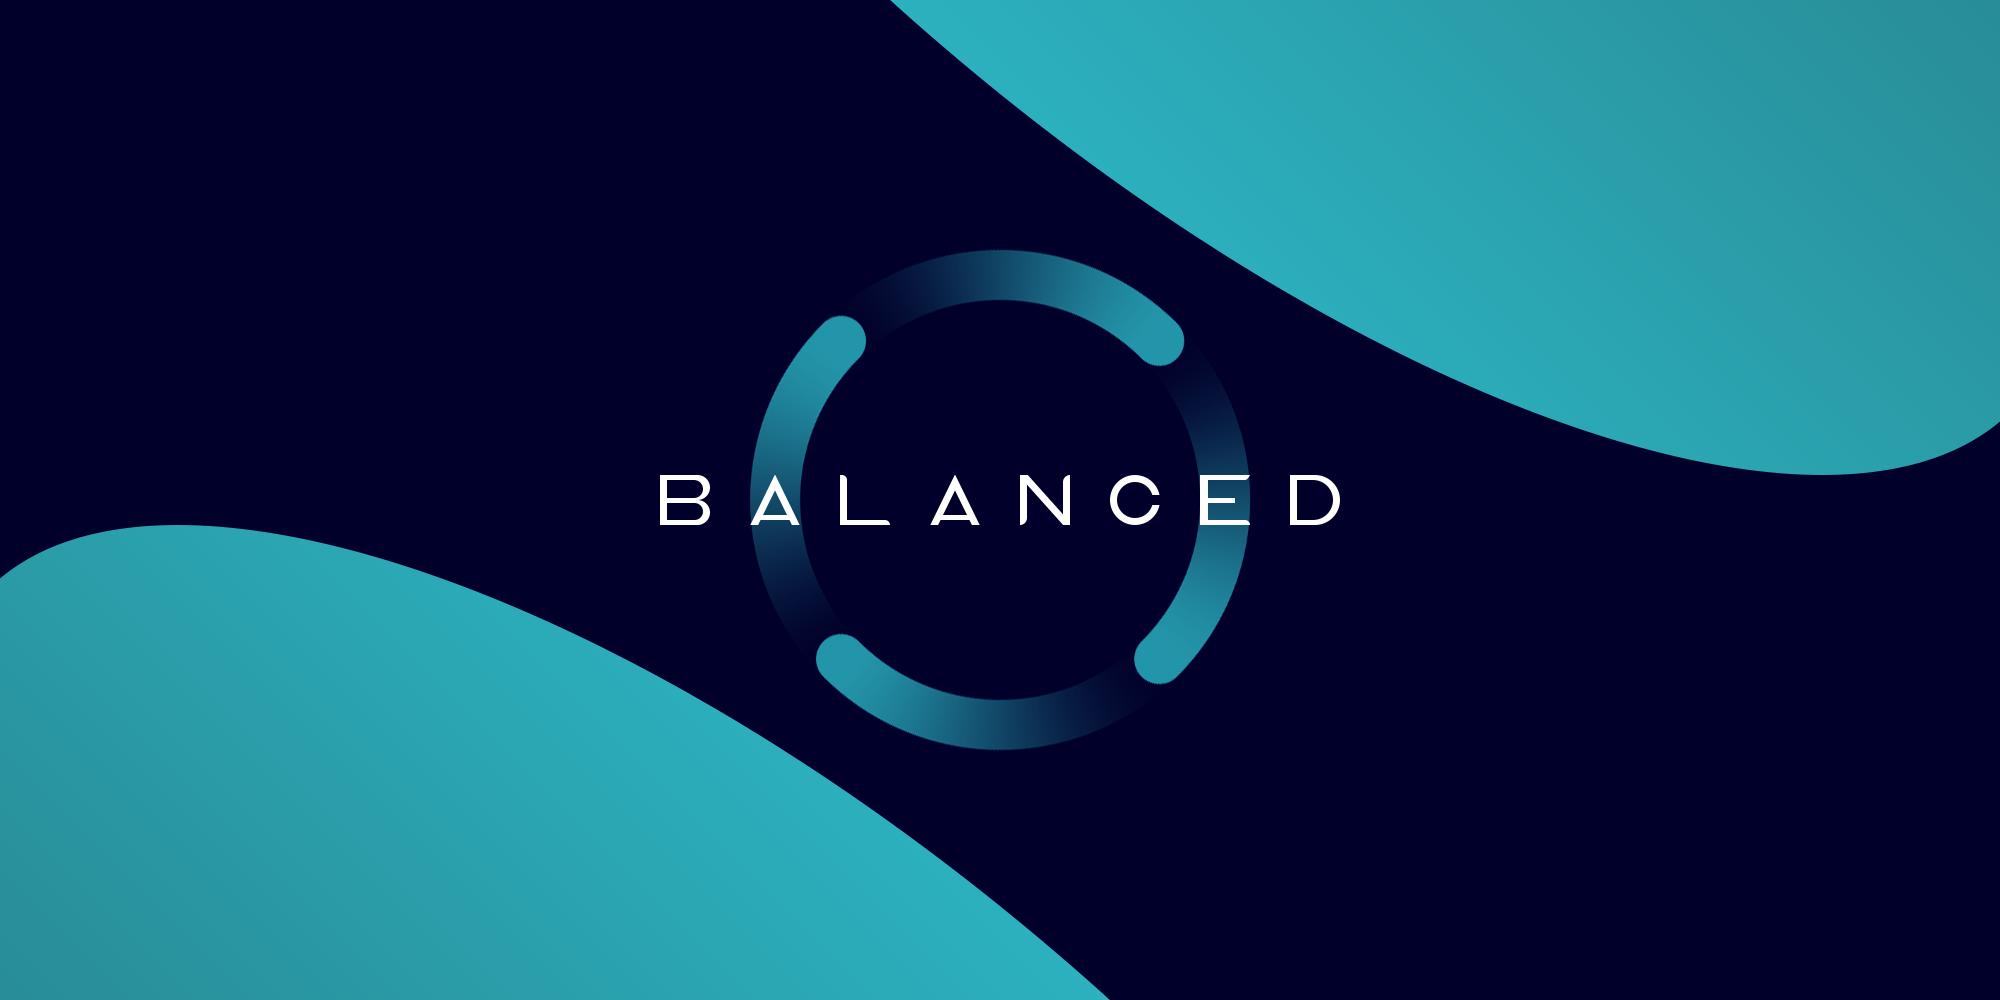 Balanced branding